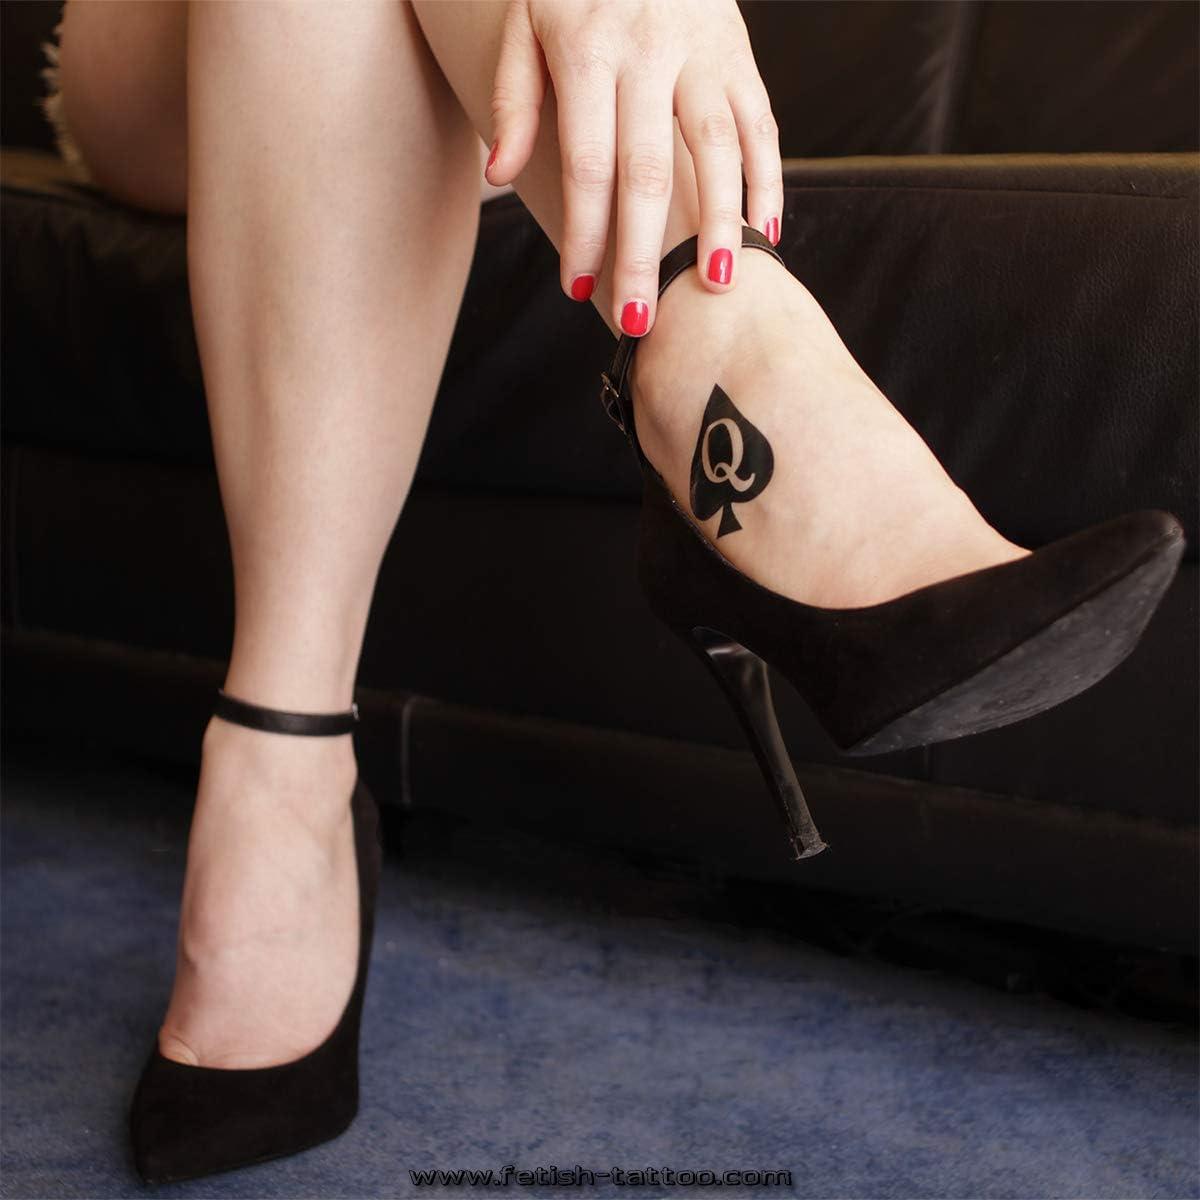 15 x Queen of Spades logo tatuaje temporal en negro - Hotwife ...